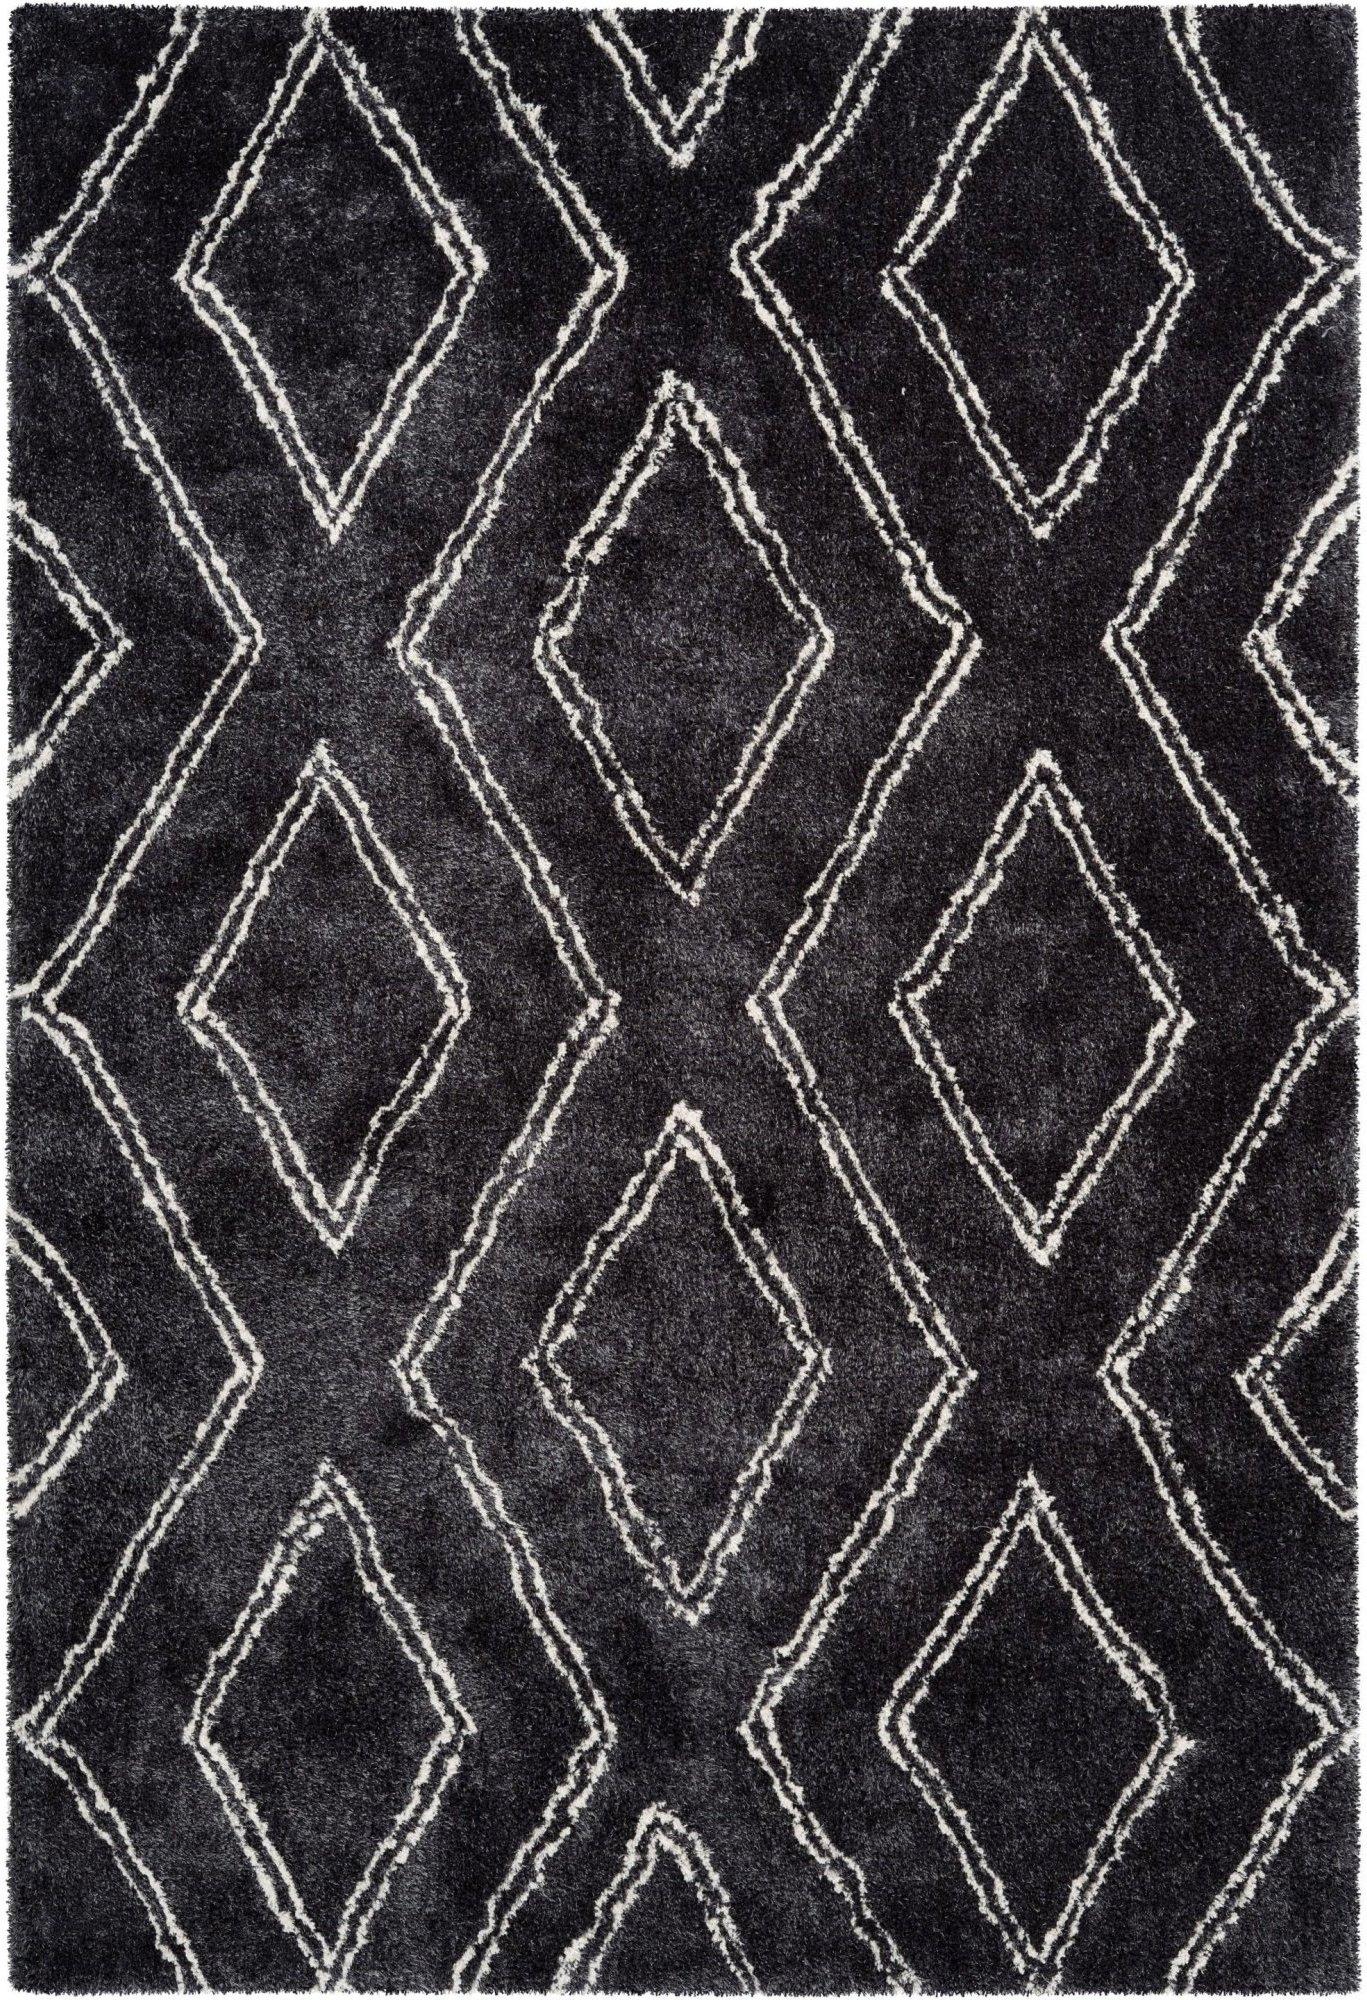 Tapis en polyester anthracite 120x170